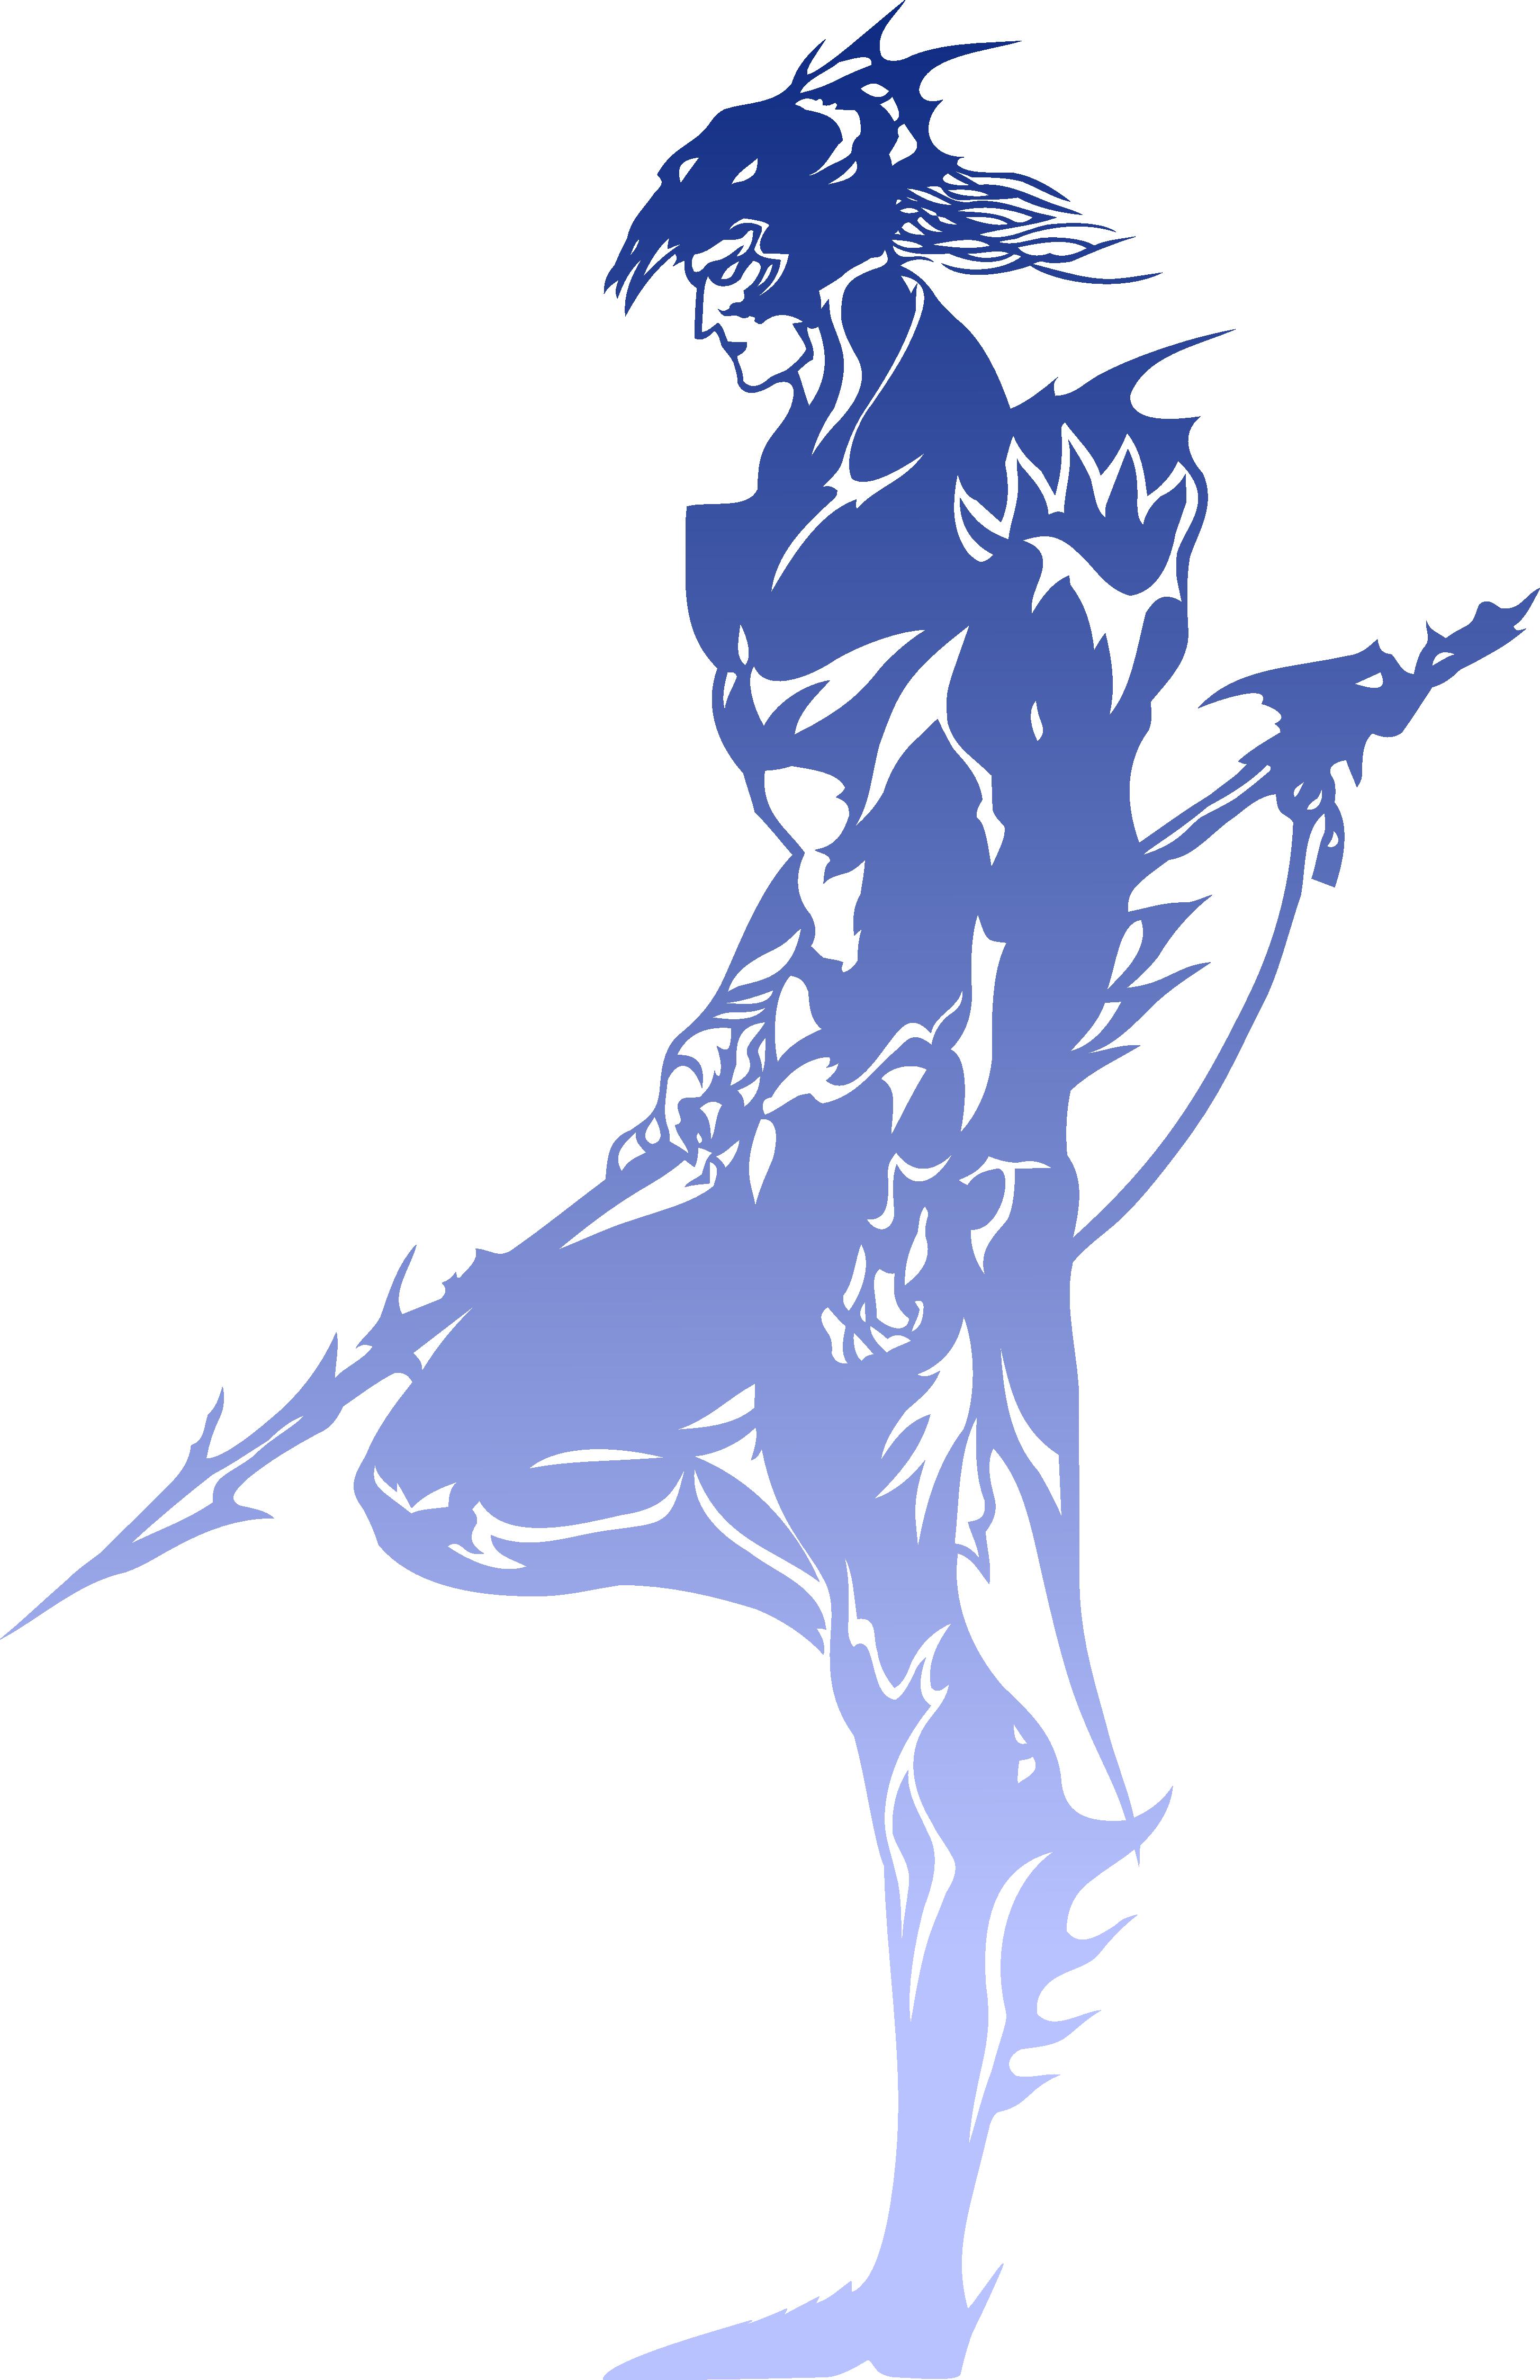 Final fantasy xii logo png - photo#49